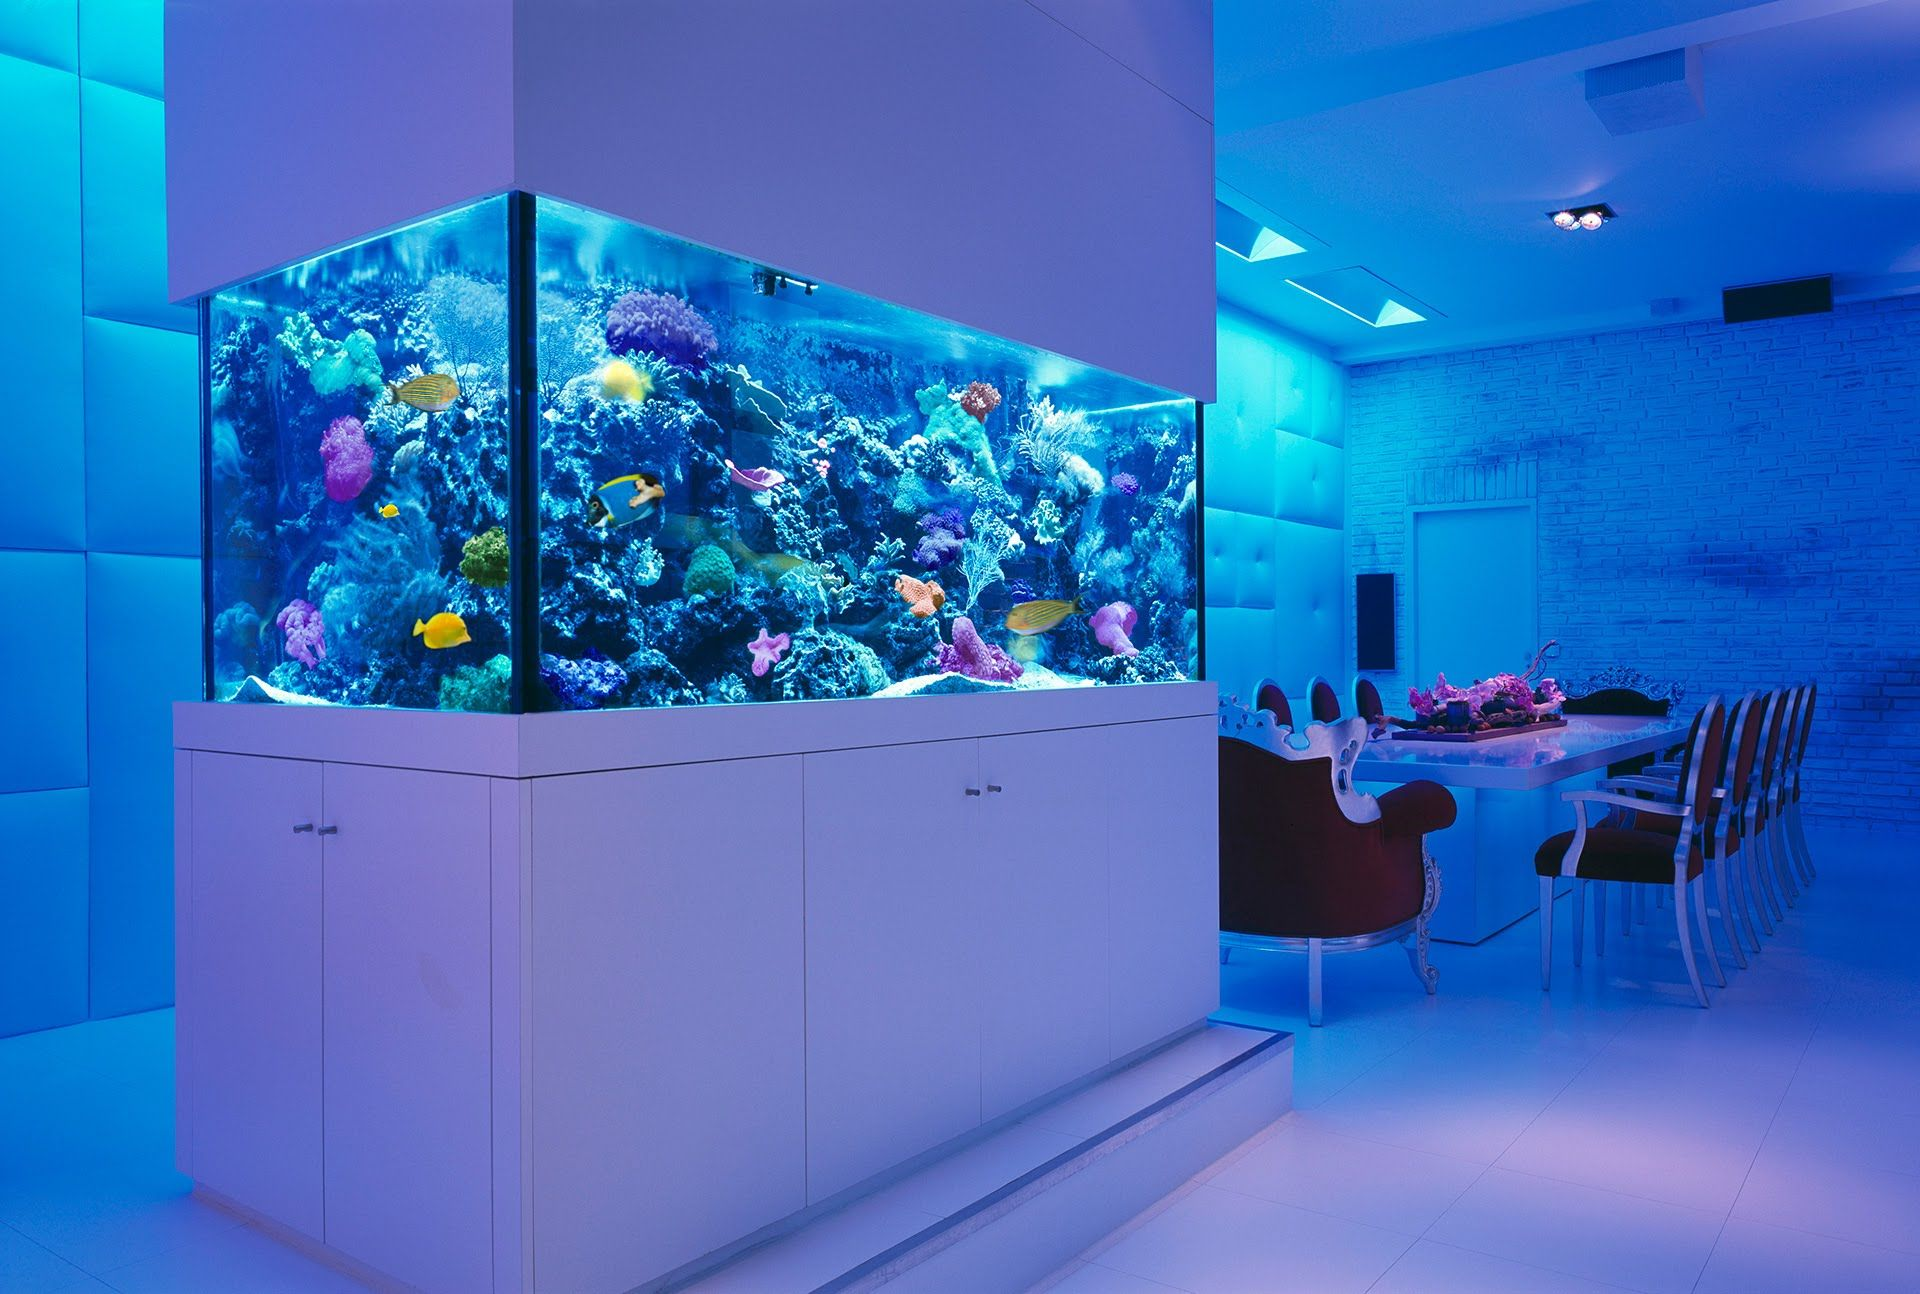 Nothing beats a good looking Aquarium! Check out the benefits to #rent an #aquarium